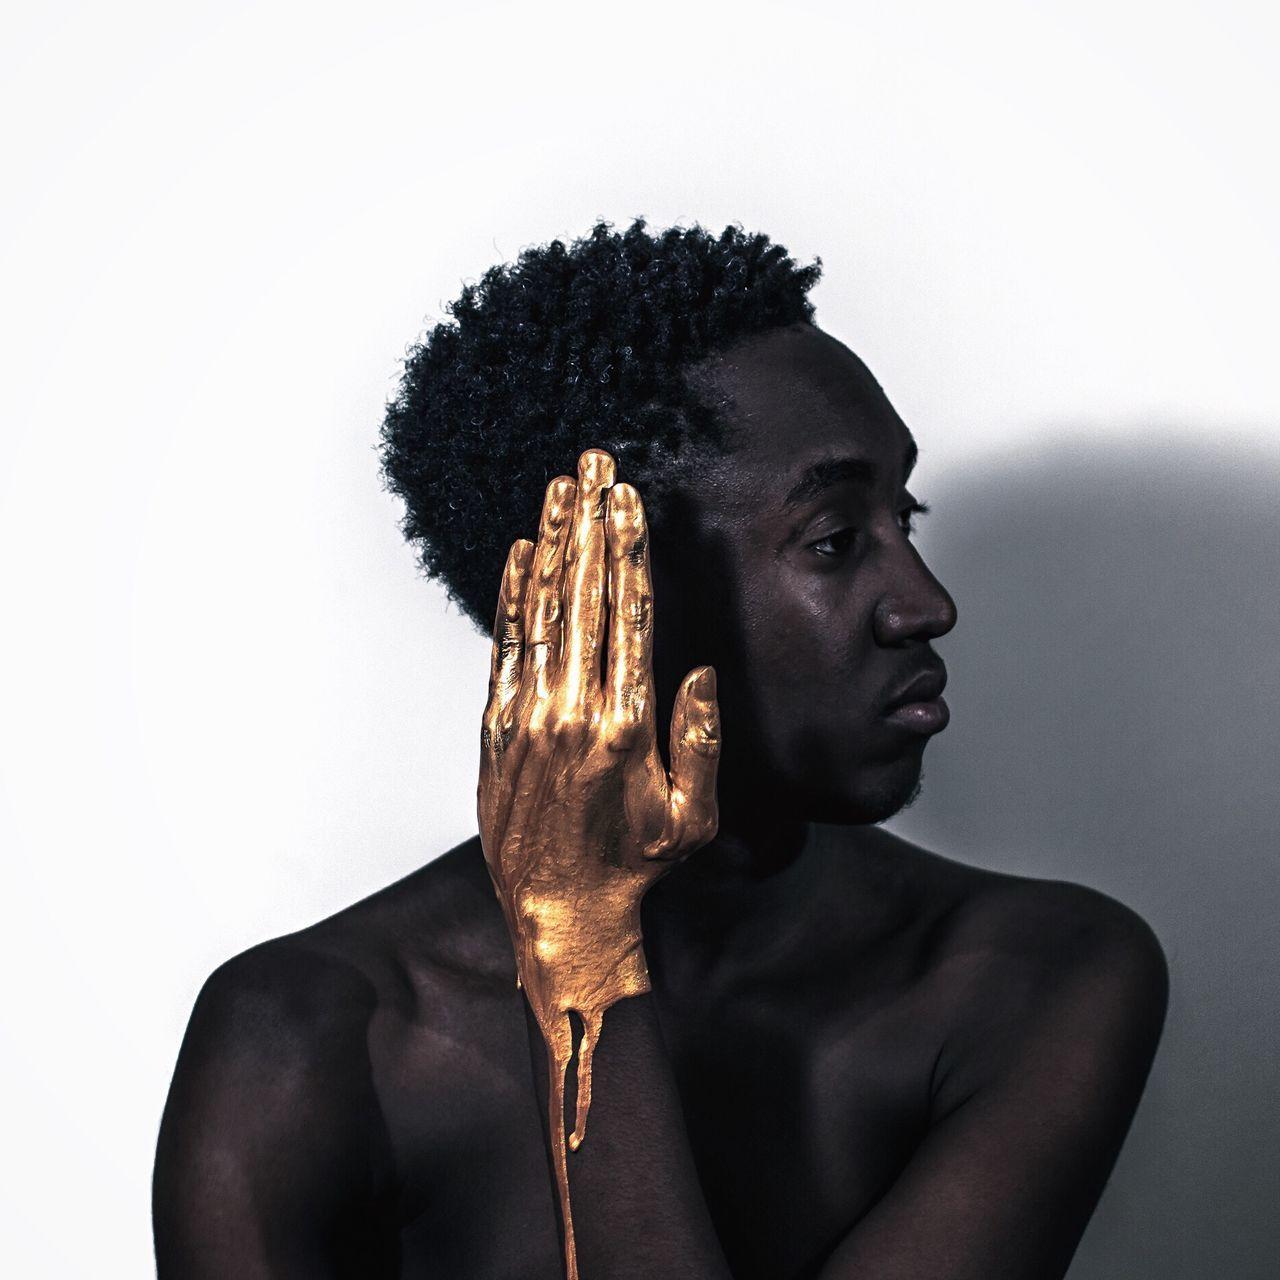 Golden paint dripping from man hand